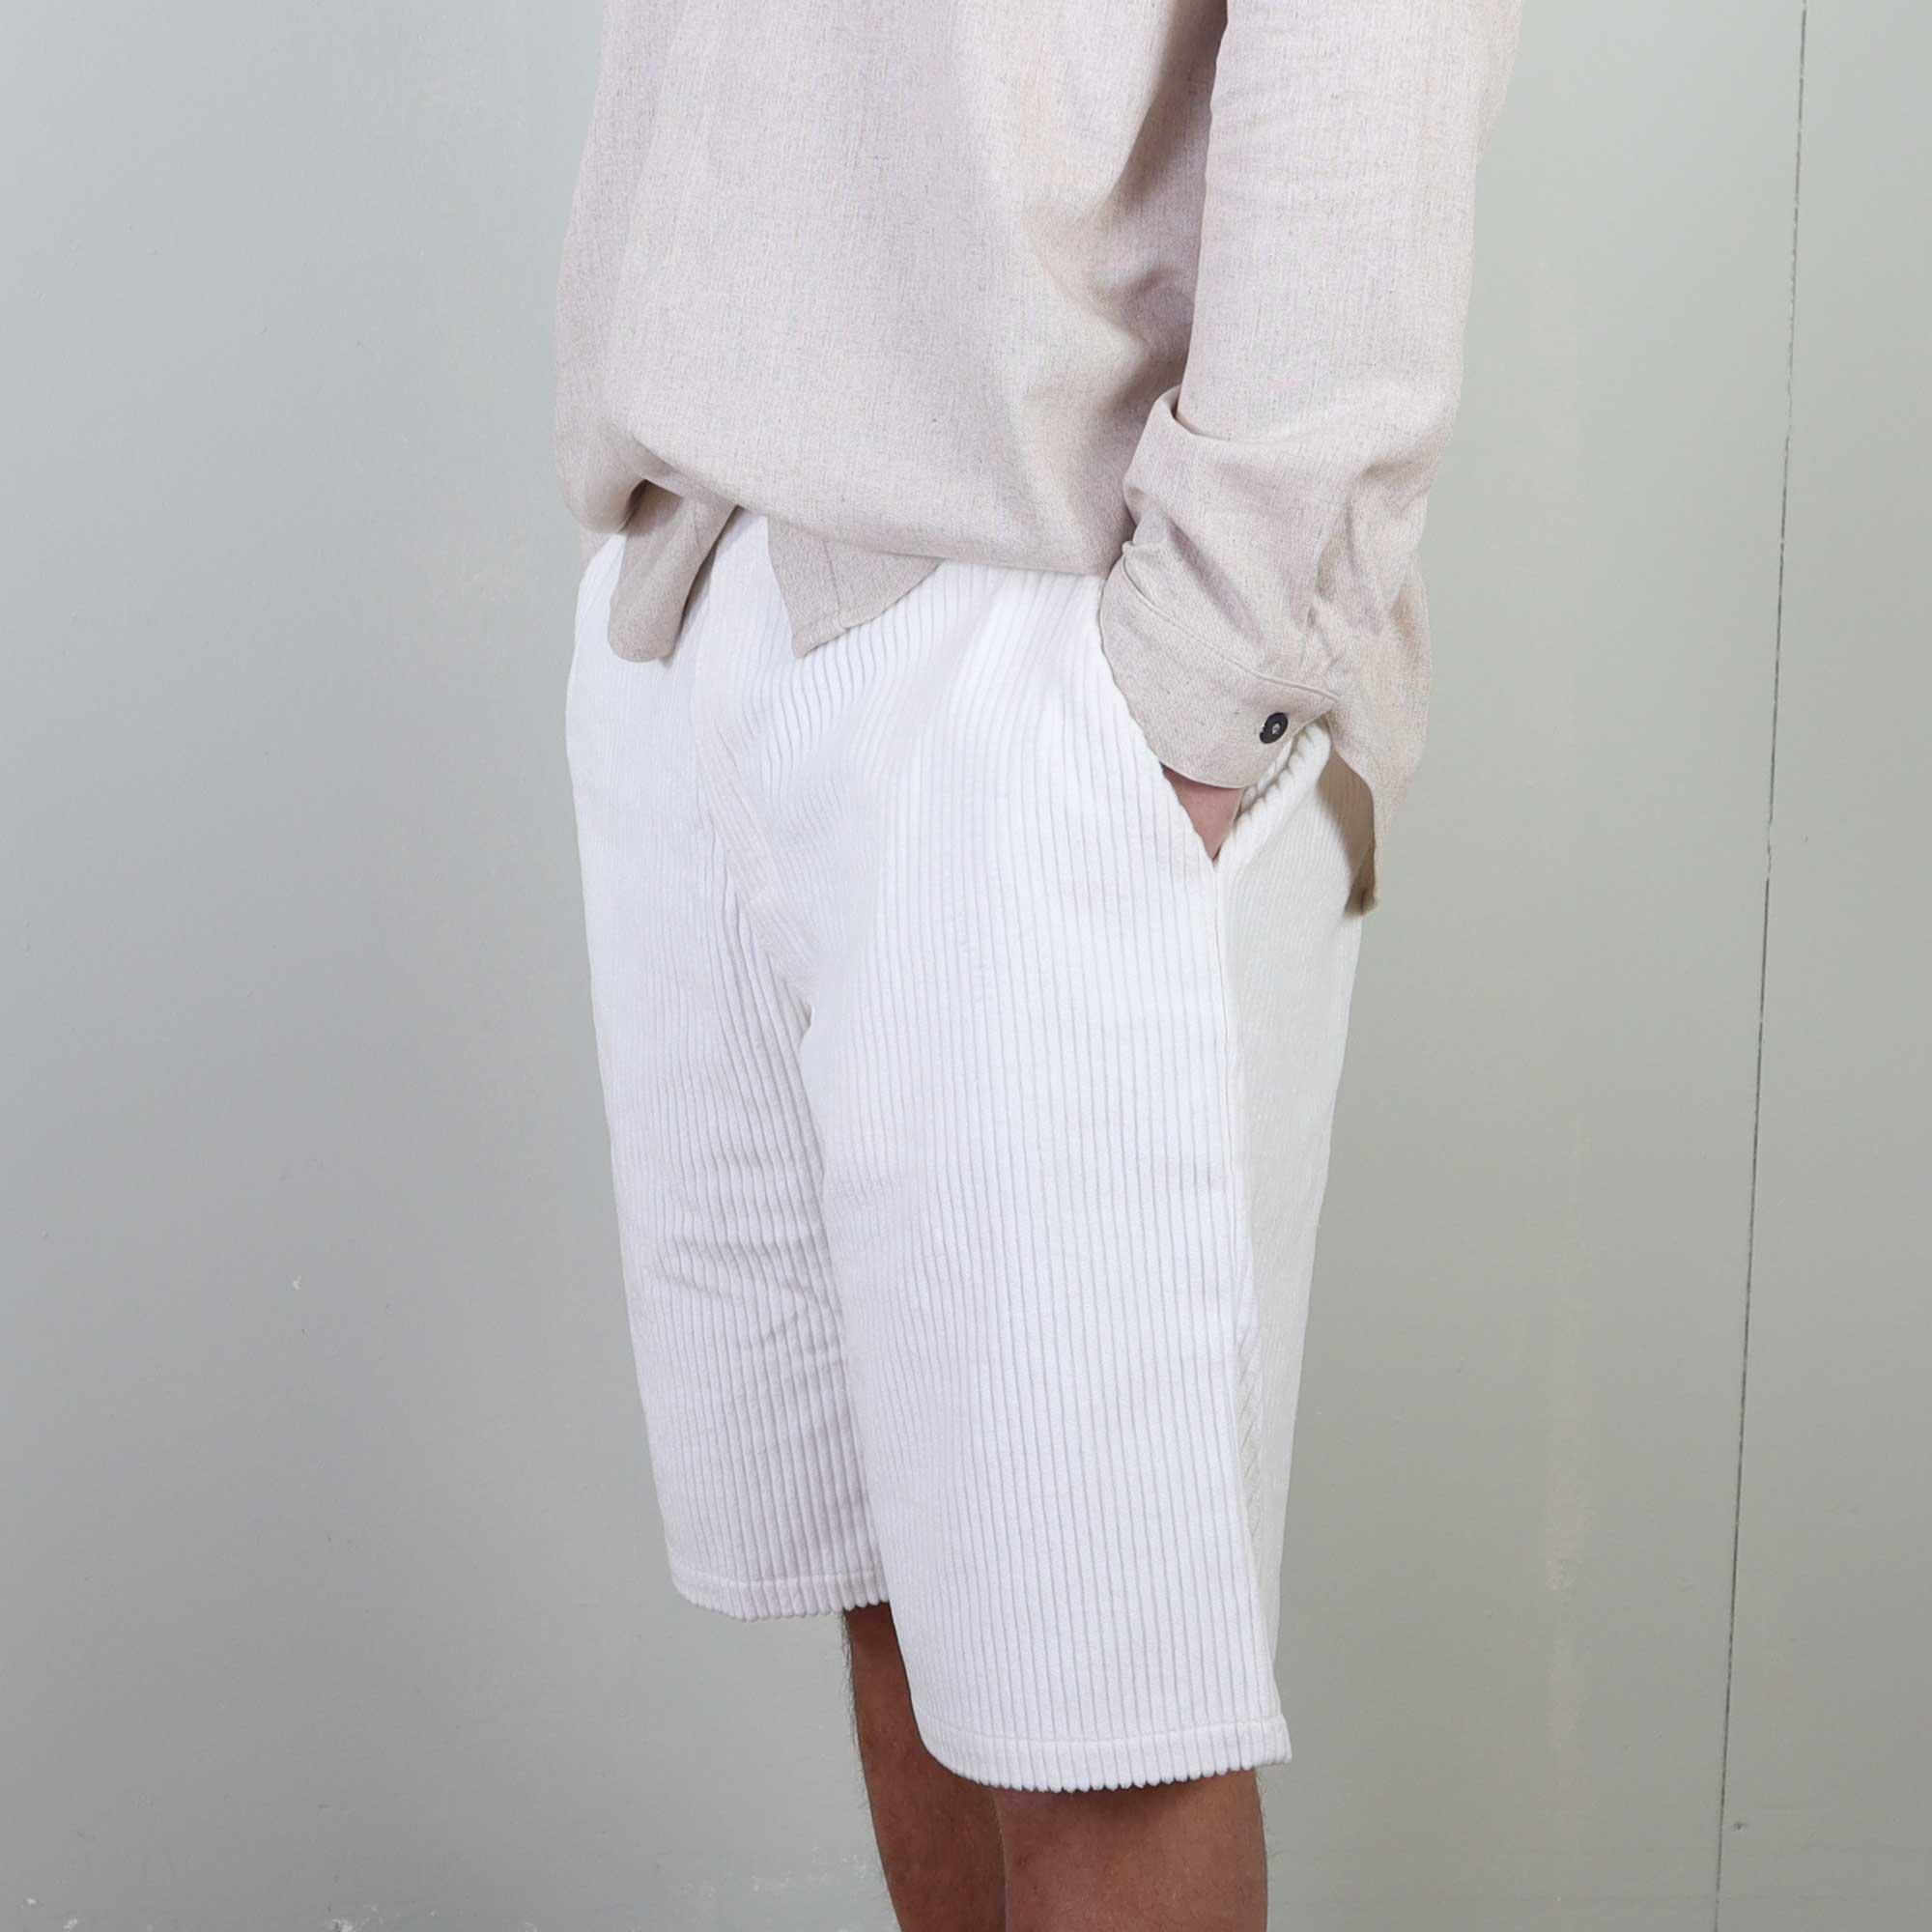 bermuda-white-3